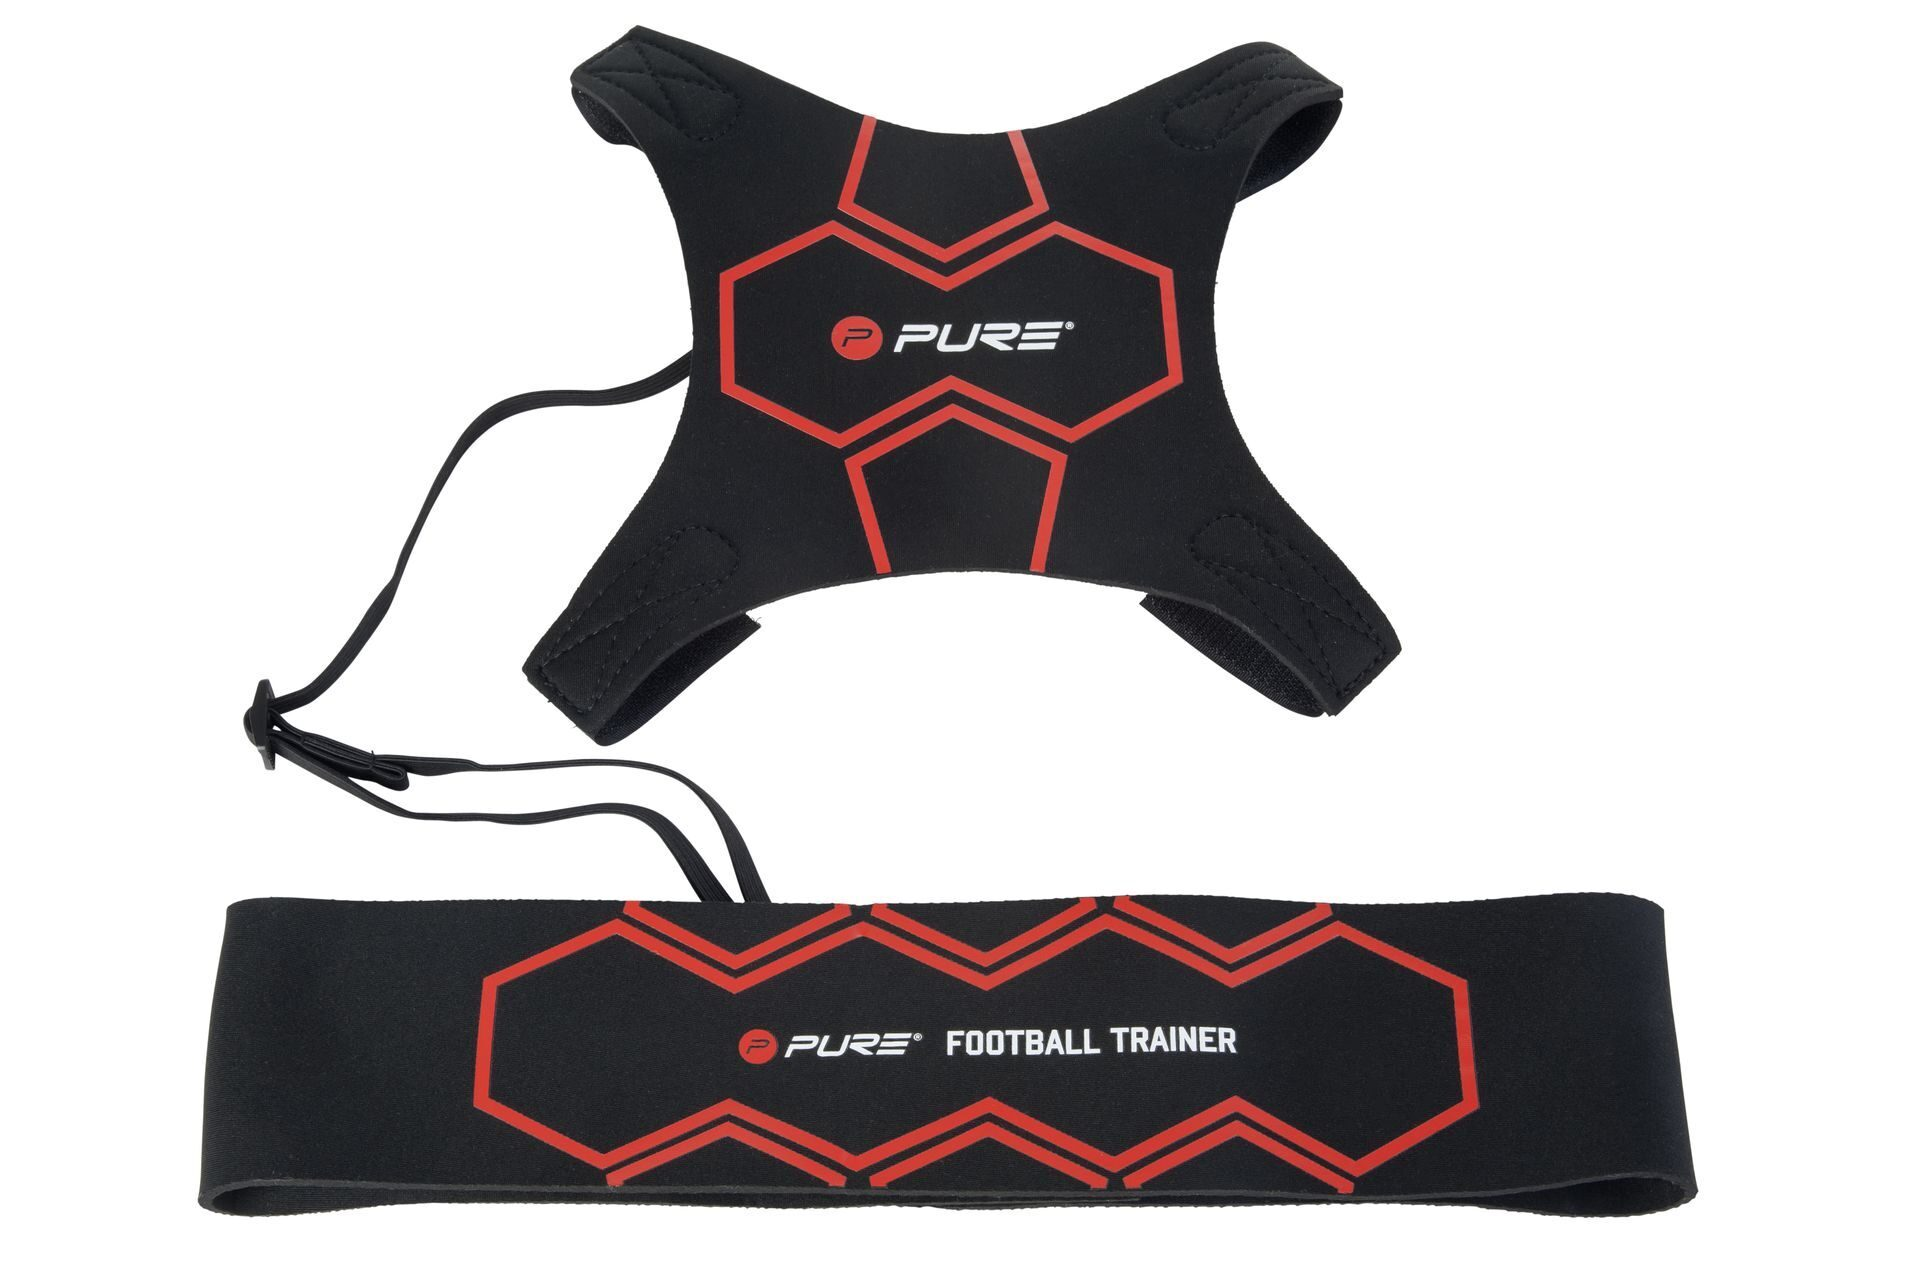 Футбольный тренажер PURE2IMPROVE FOOTBALL TRAINER.  futbolnyy trenazher pure2improve football trainer 2.jpg 647a7a458e7